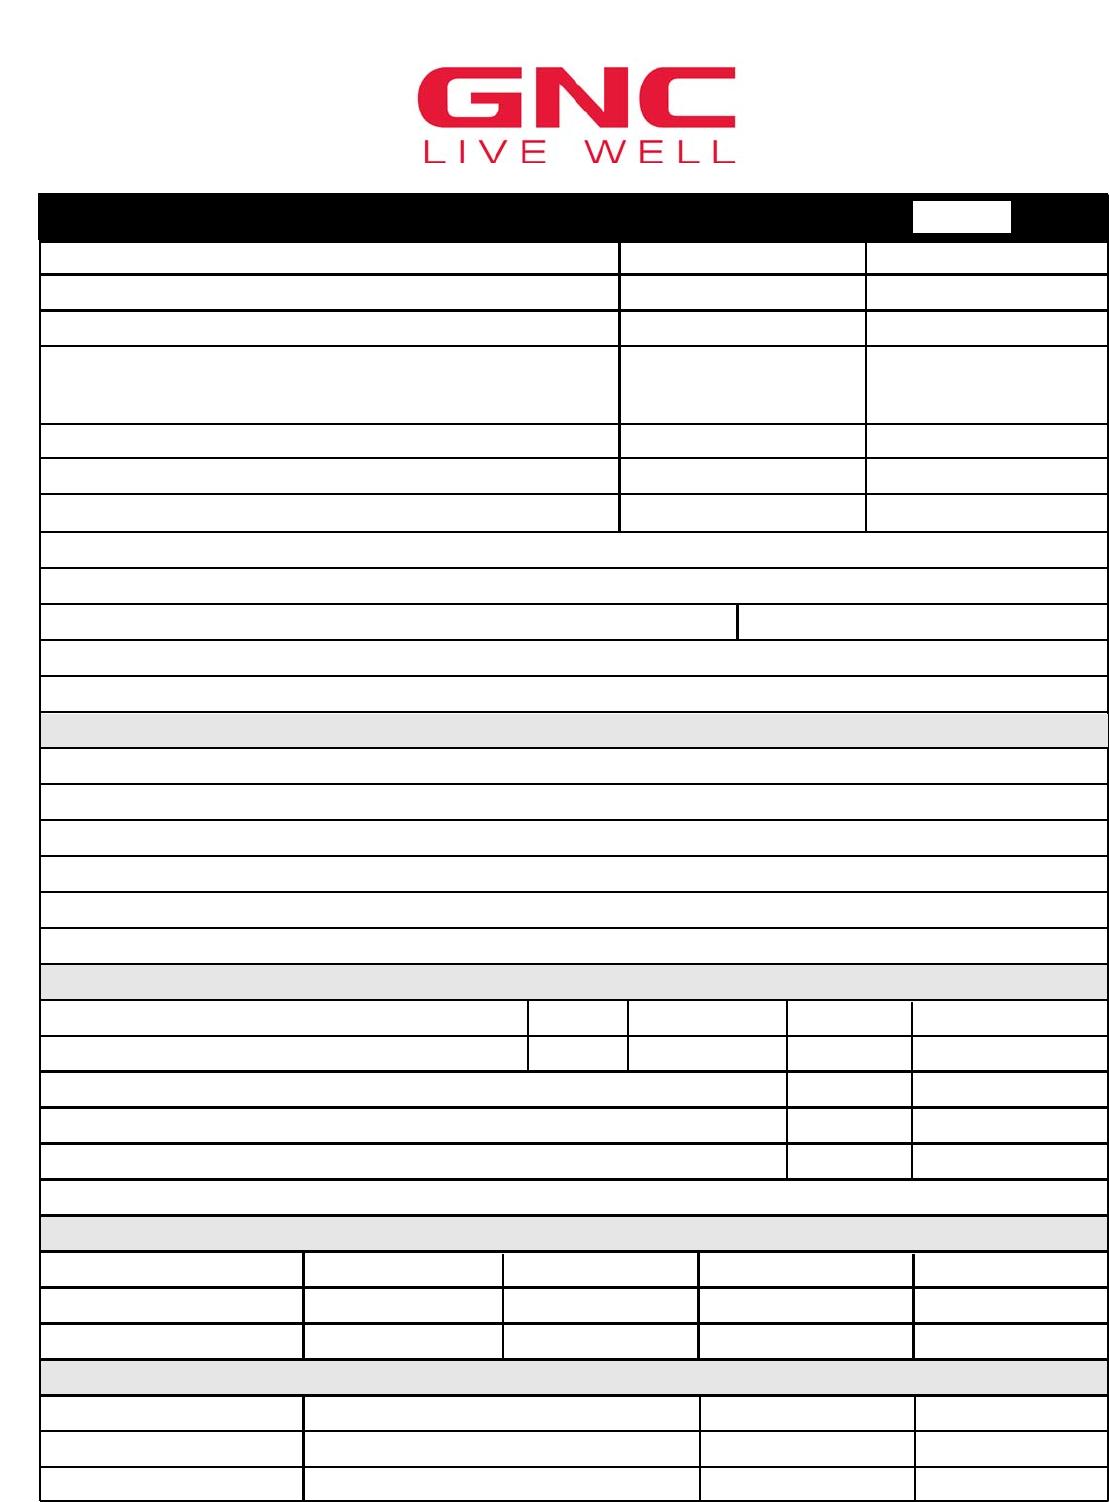 Free Printable GNC Job Application Form Page 8